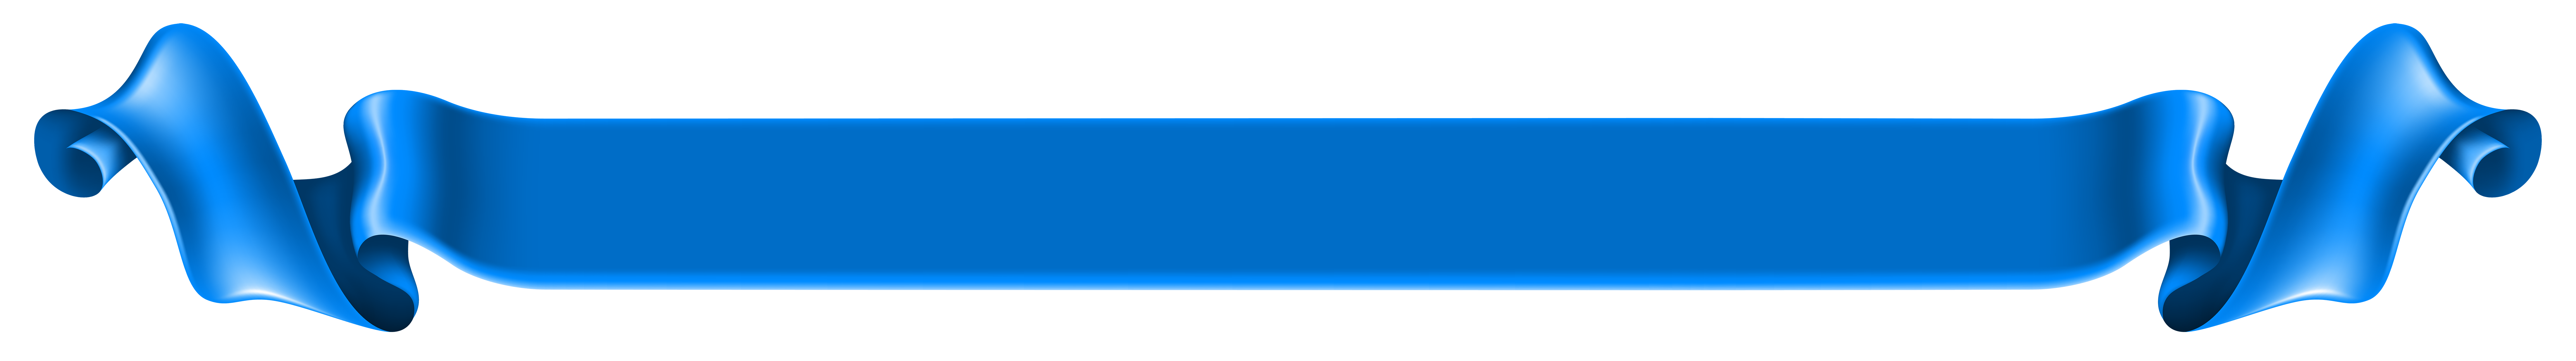 Long Blue Banner Transparent PNG Clip Art Image.